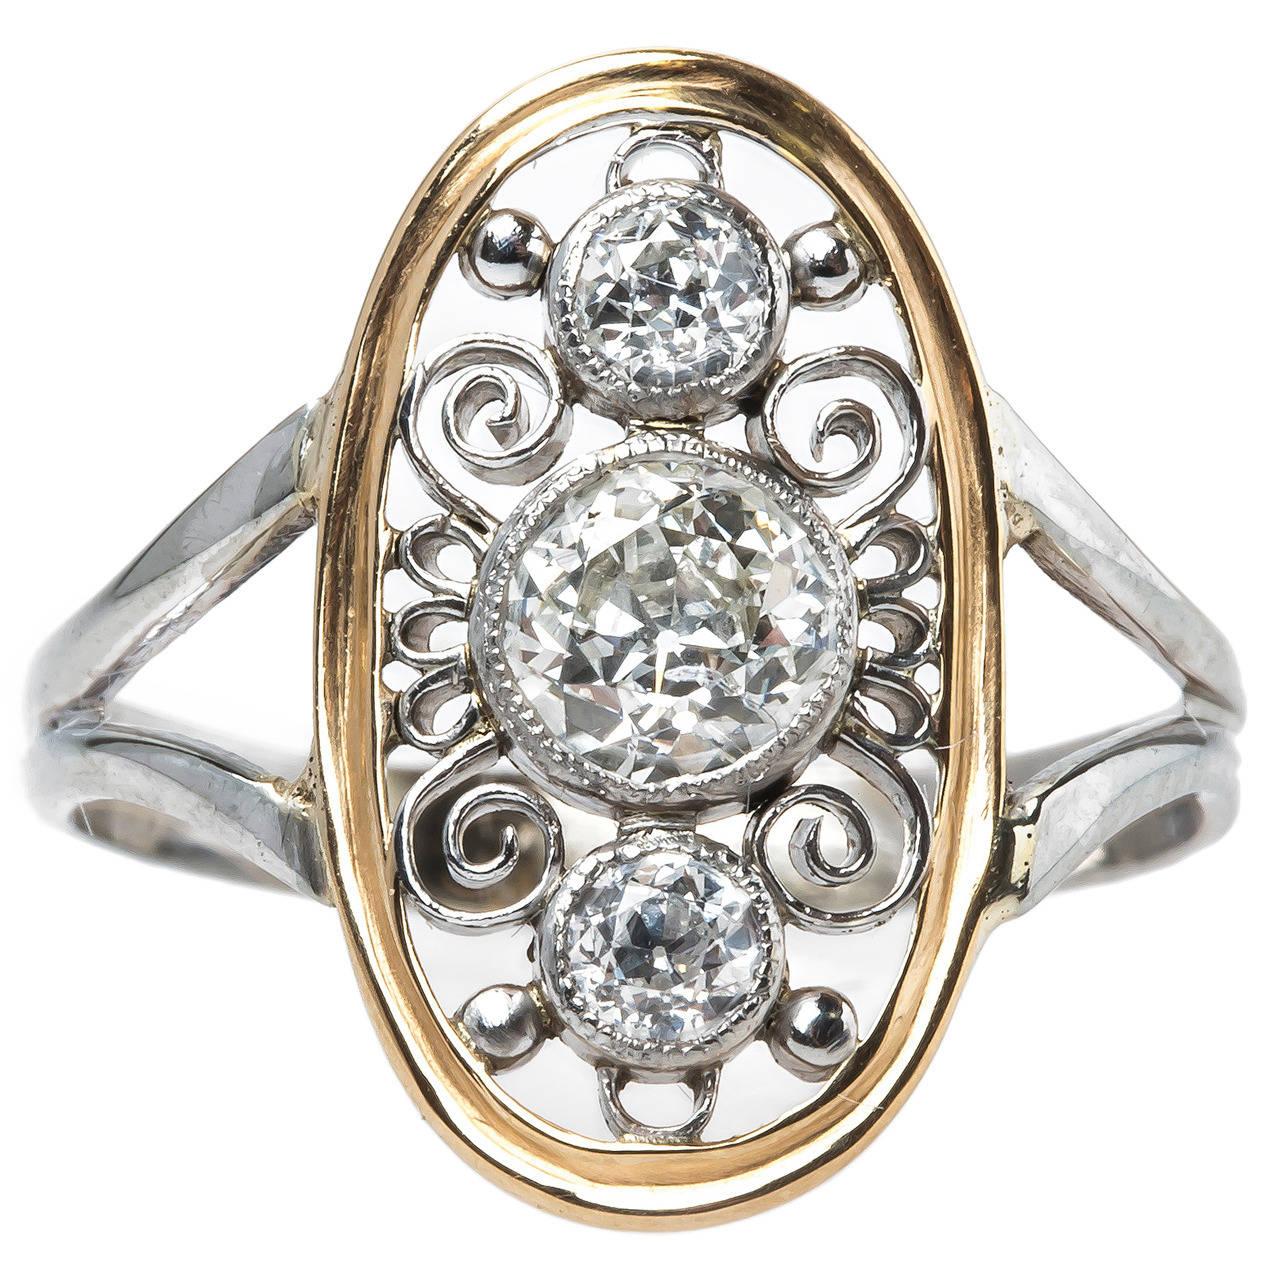 Intricate Edwardian Era Navette Style Diamond Engagement Ring at 1stdibs